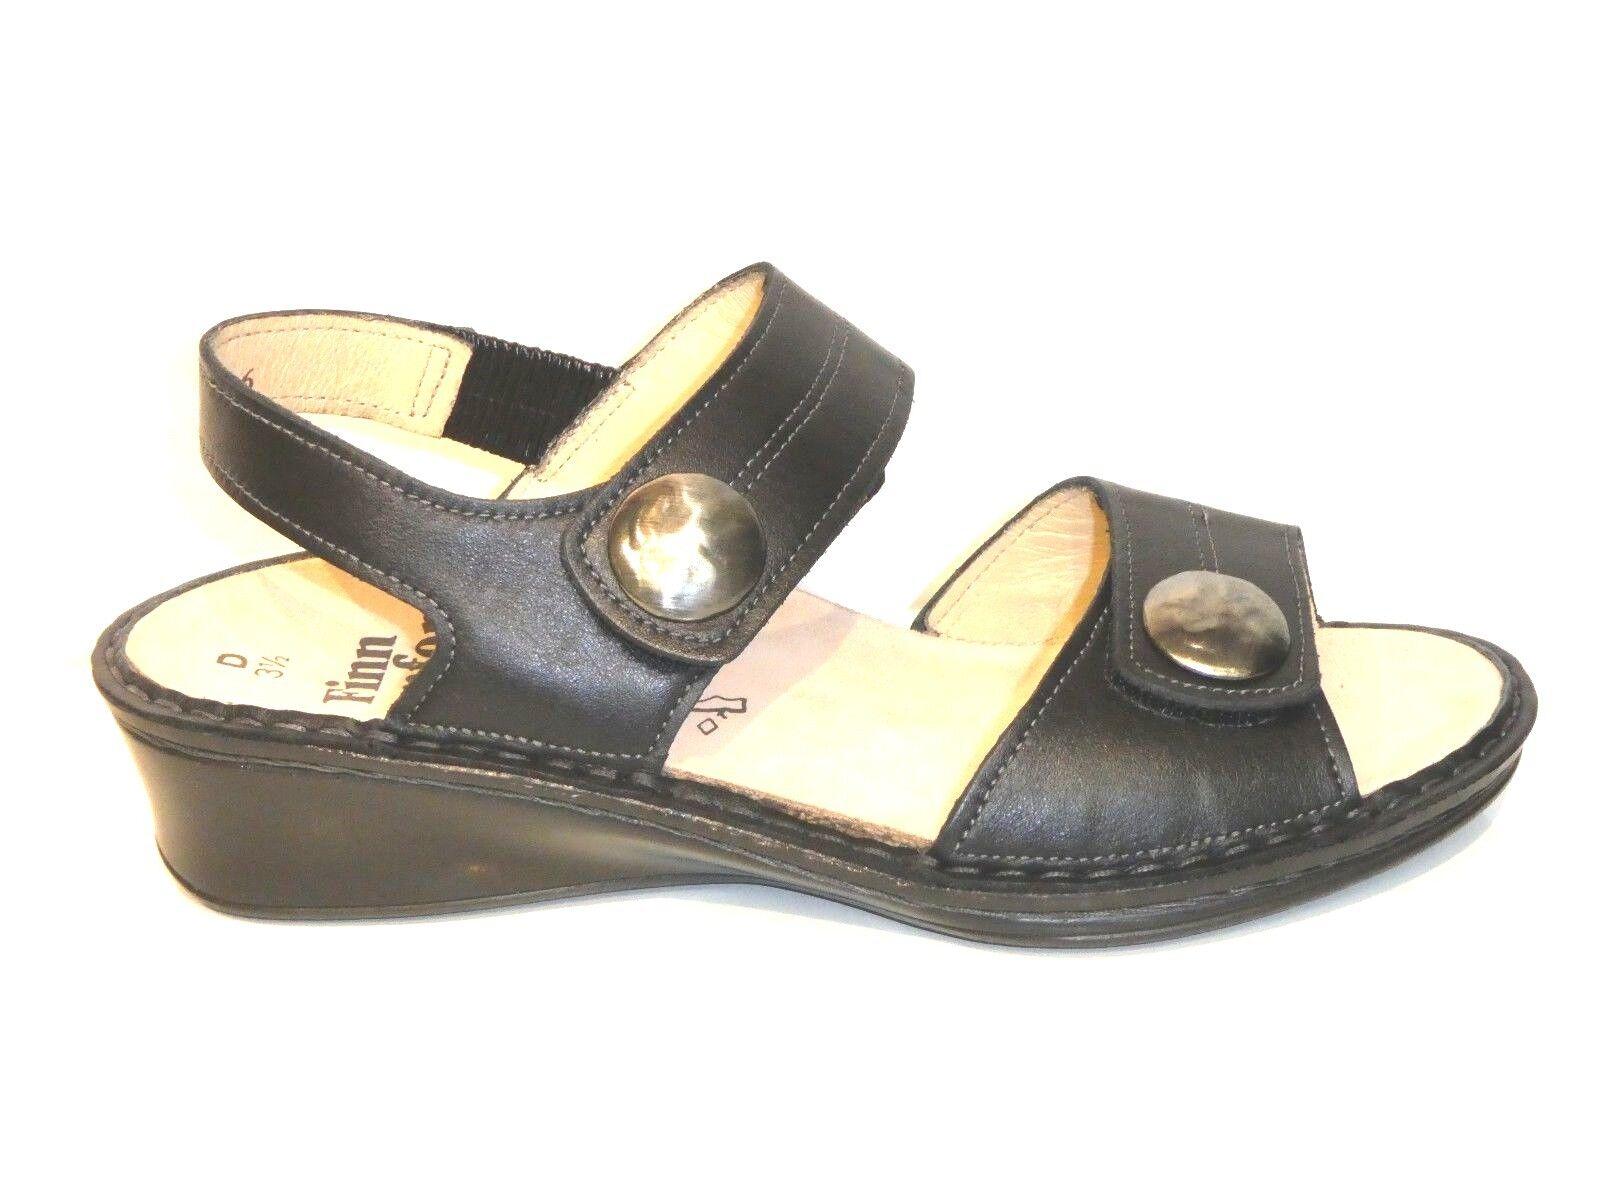 Finn Comfort Schuhe Sandalen Pantoletten Alanya schwarz Leder Einlagen bequem